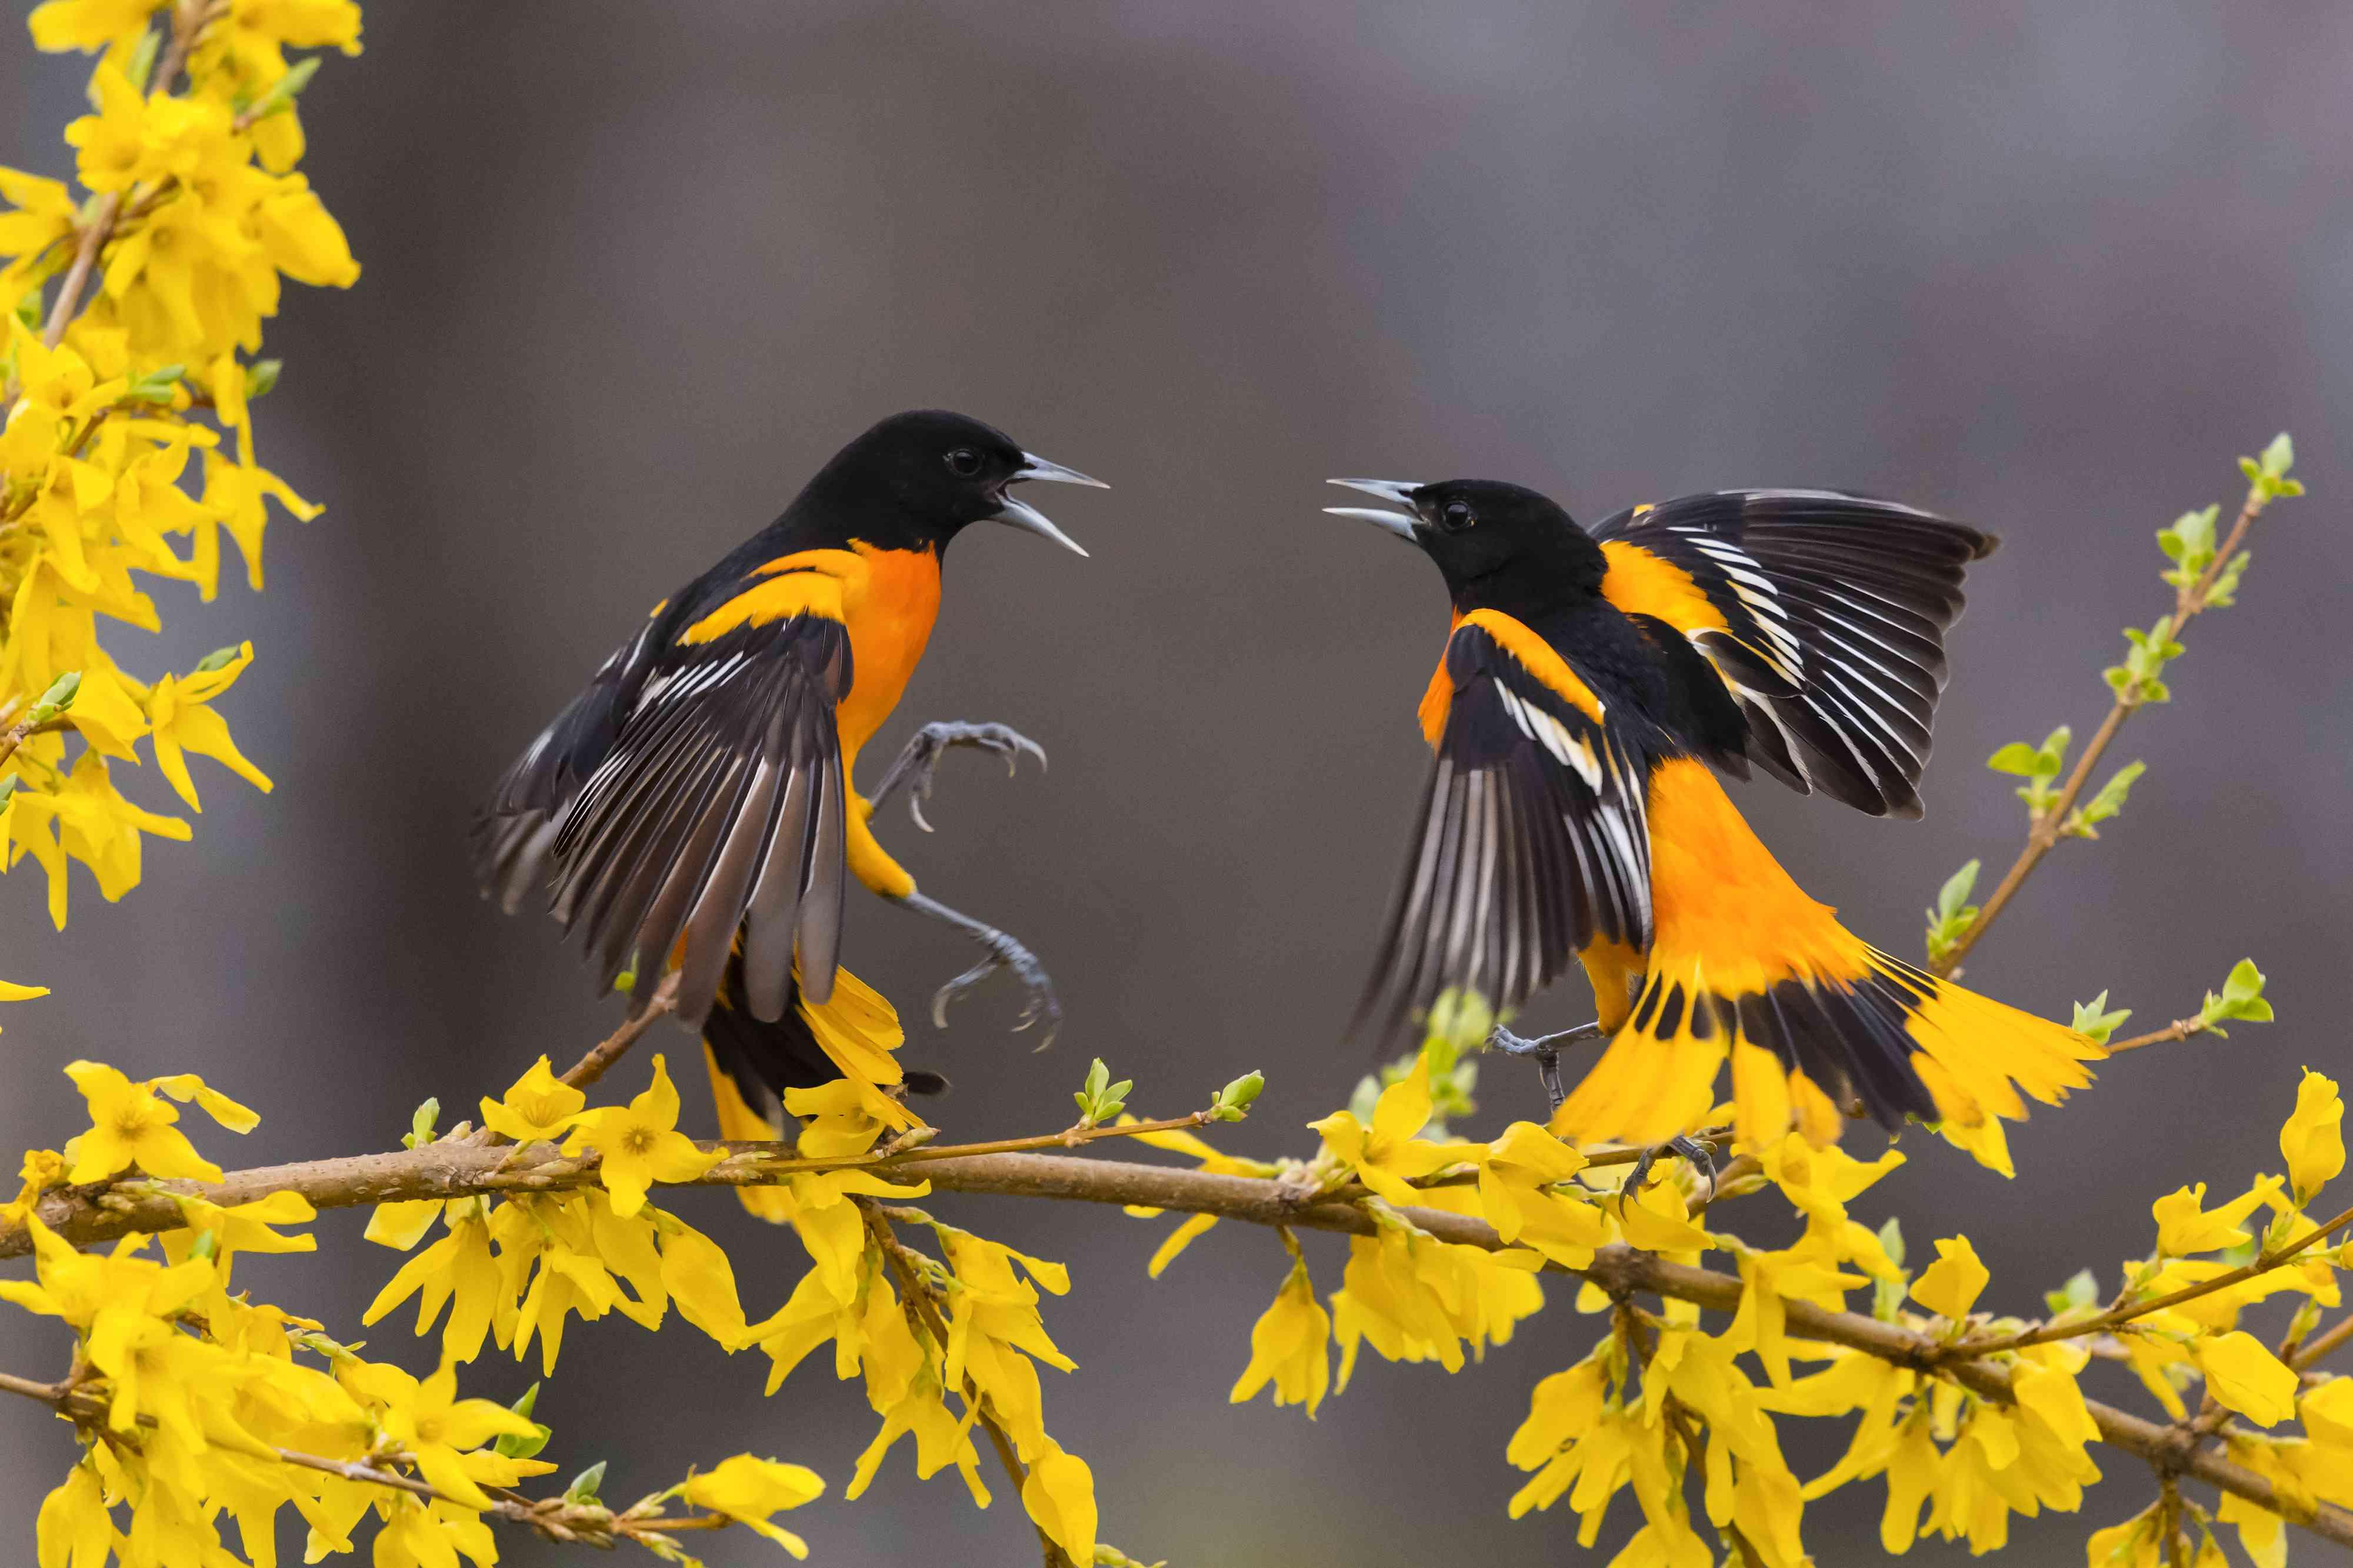 Baltimore oriole, icterus galbula, two male birds fighting